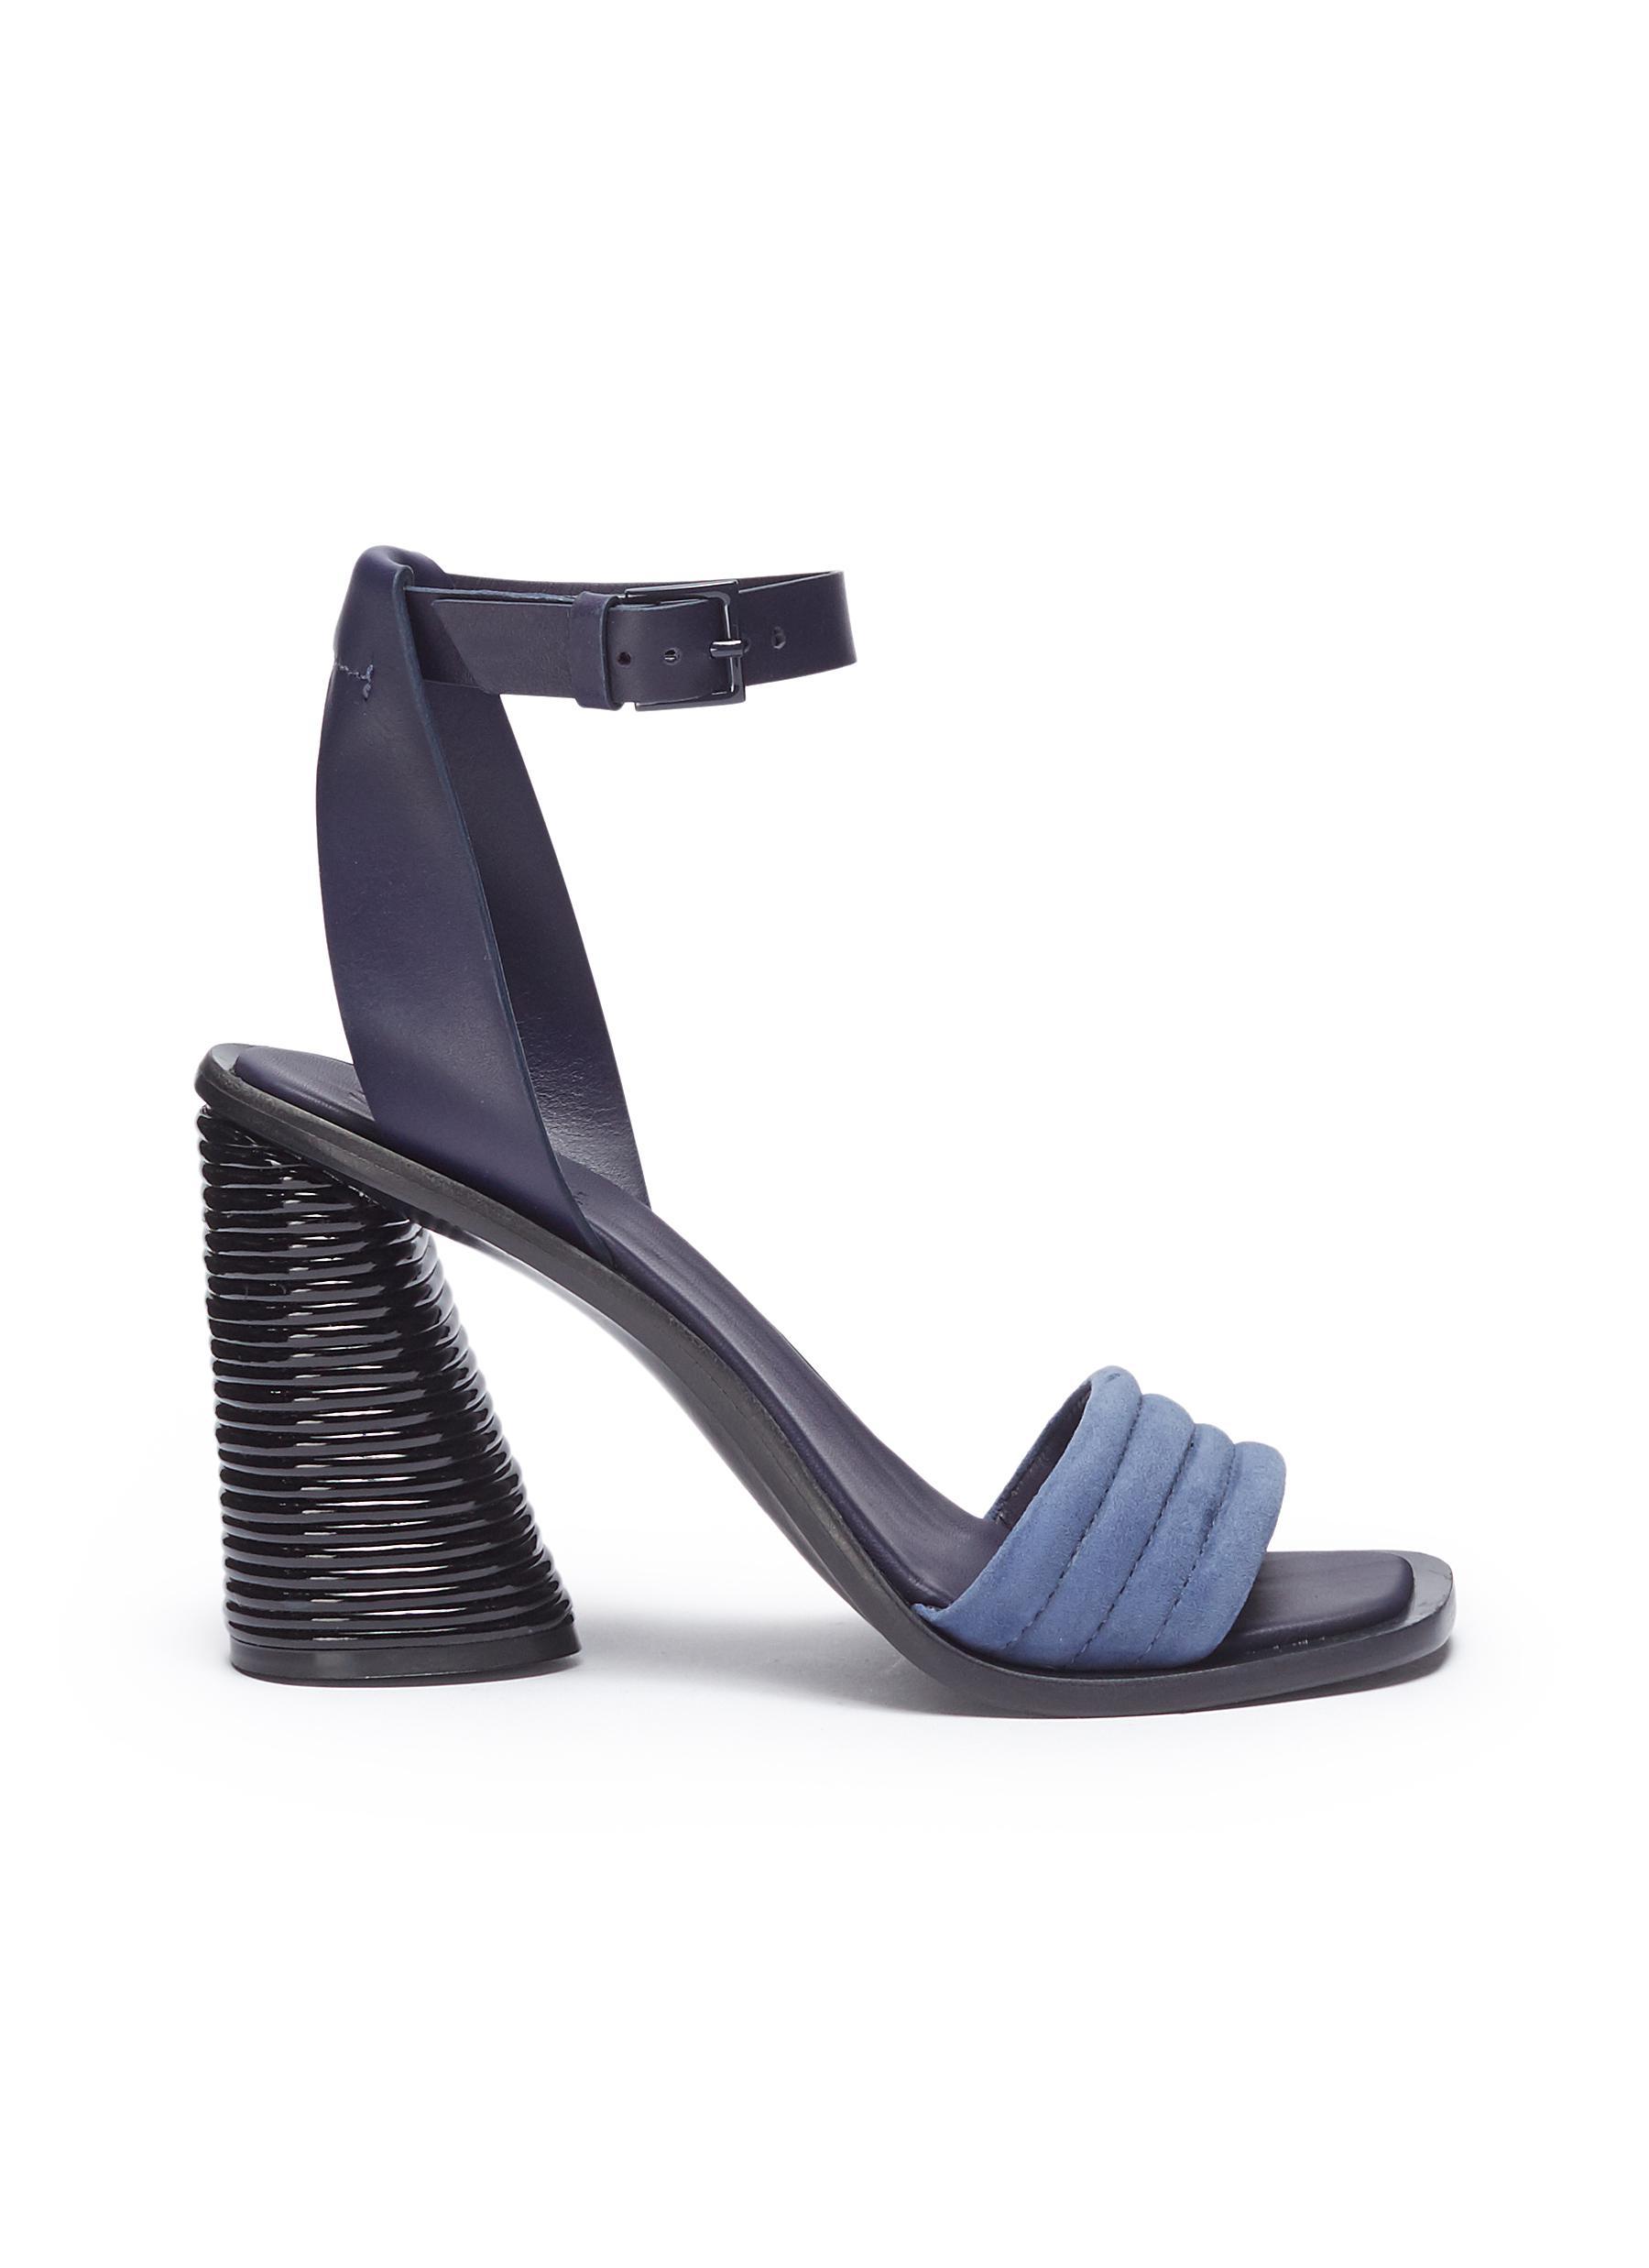 Hiru sculptural heel leather ankle strap suede sandals by Mercedes Castillo